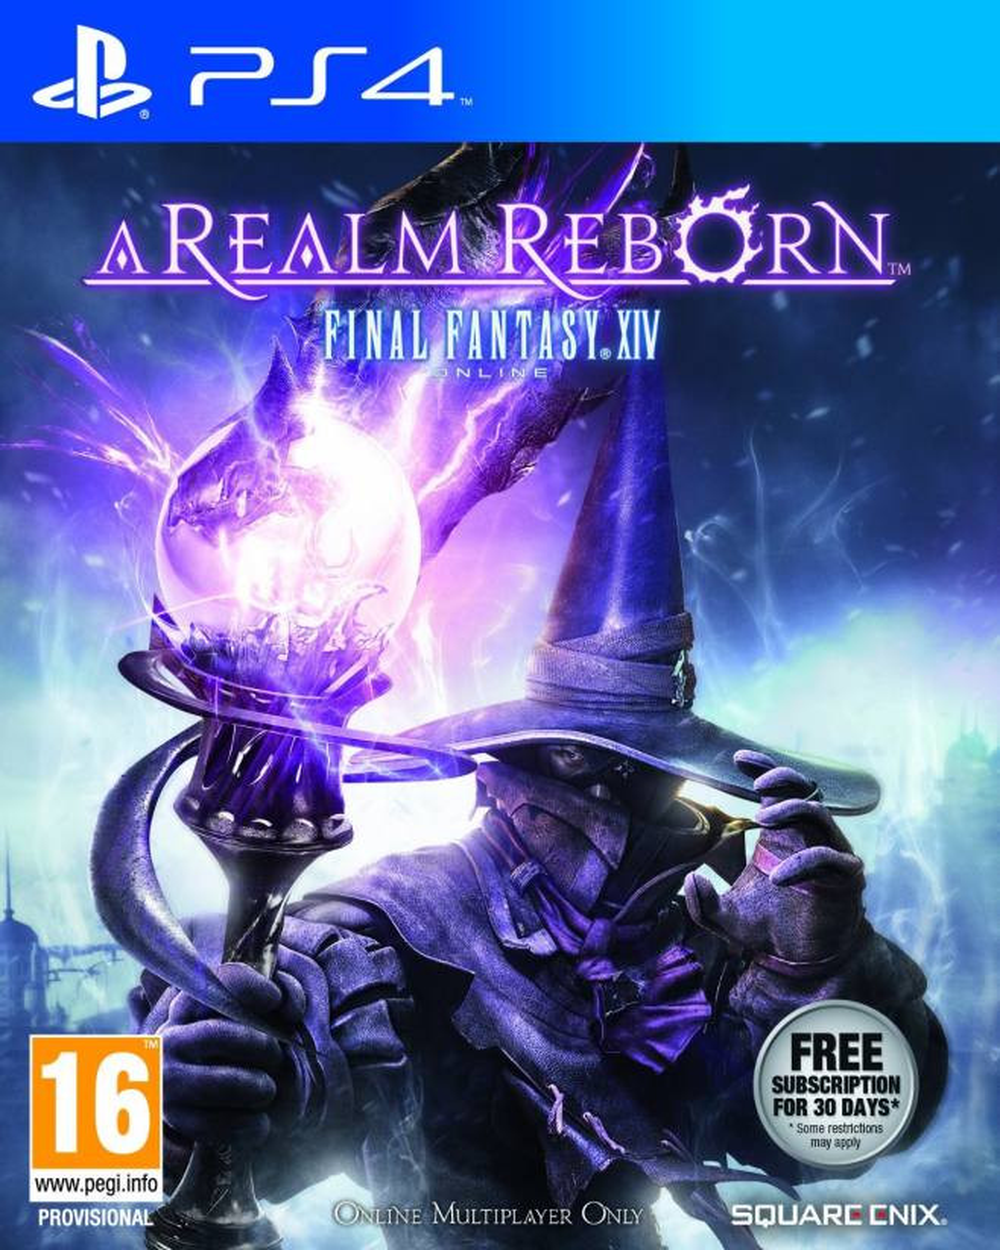 PS4 A Realm Reborn - Final Fantasy XIV